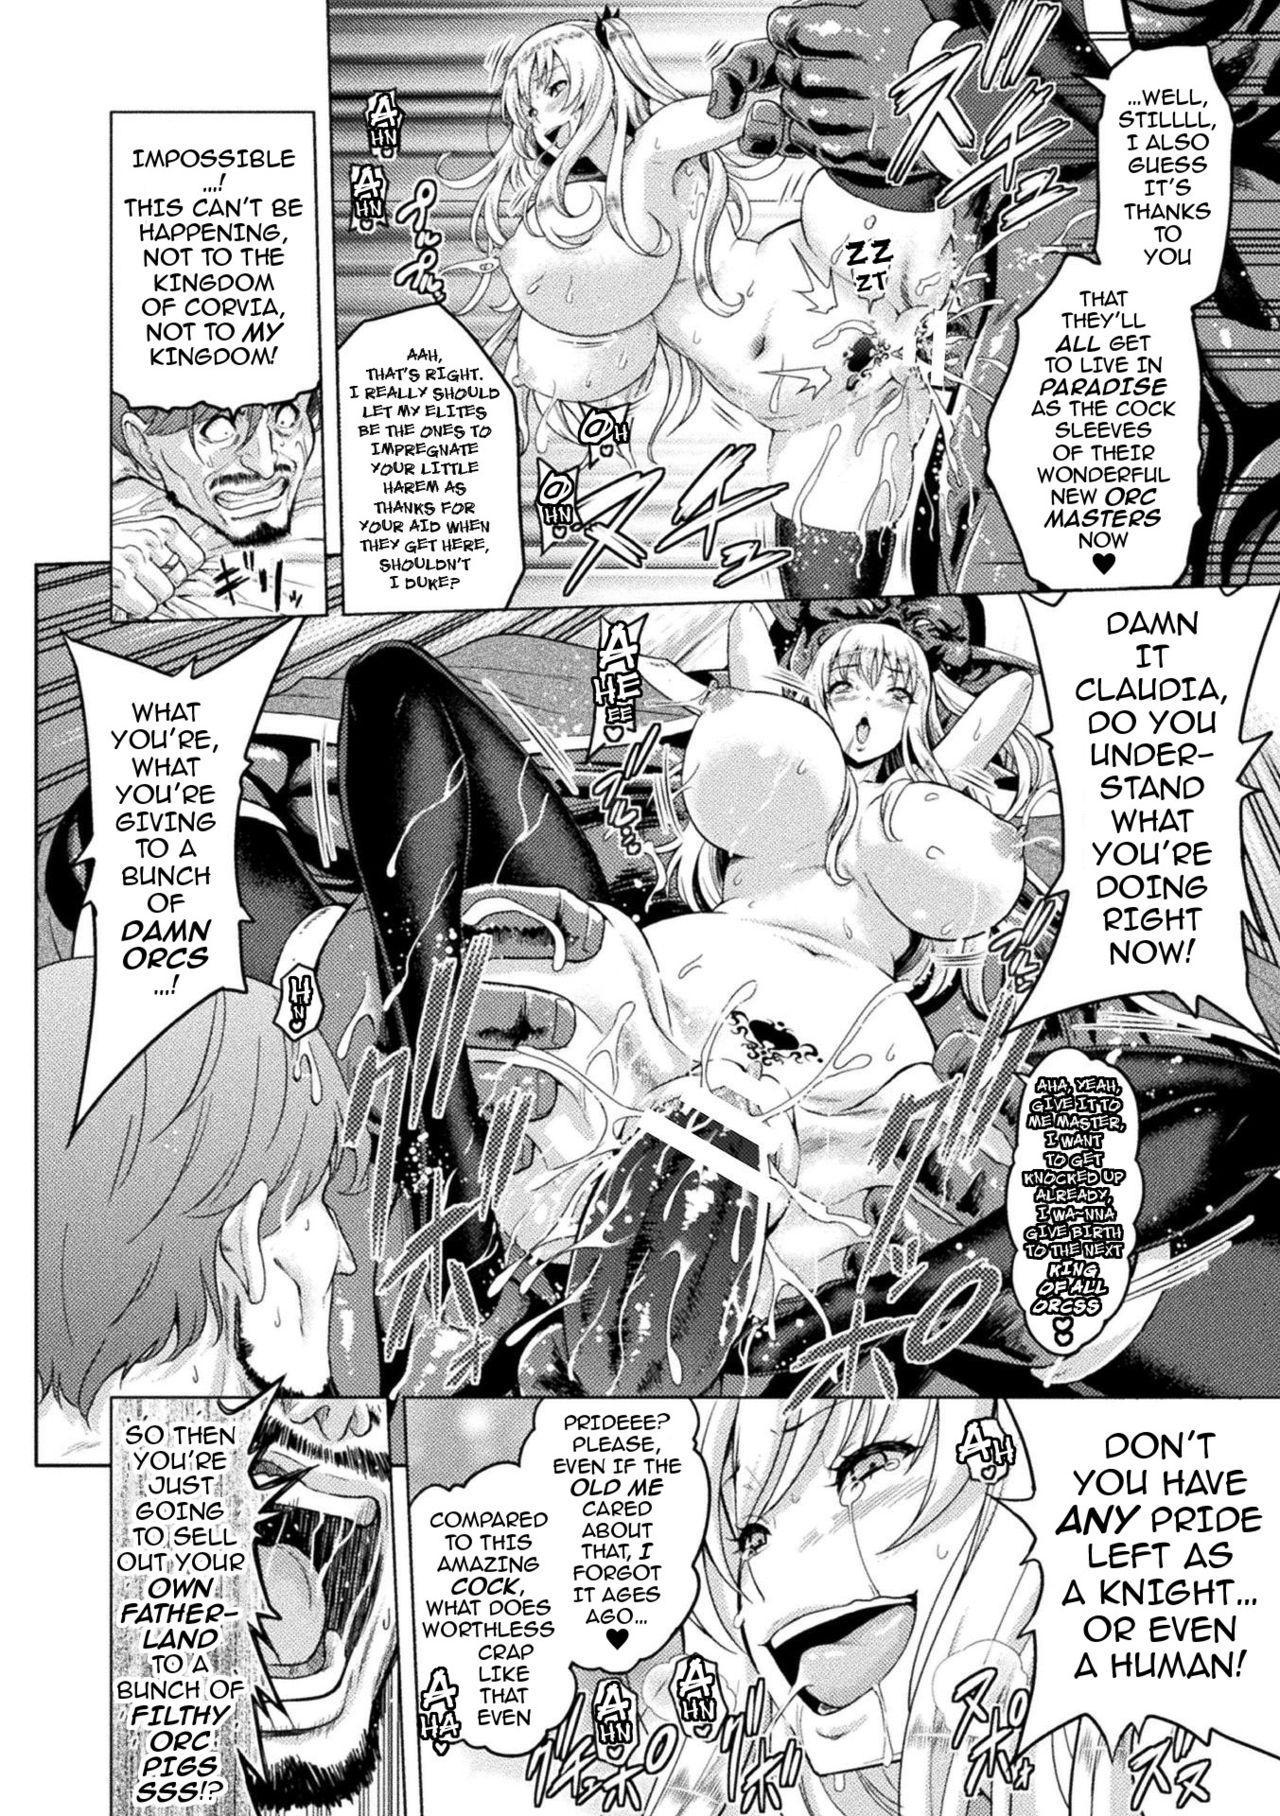 [Yamada Gogogo] Erona ~Orc no Inmon ni Okasareta Onna Kishi no Matsuro~ | Erona ~The Fall of a Beautiful Knight Cursed with the Lewd Mark of an Orc~ [English] {darknight} 98